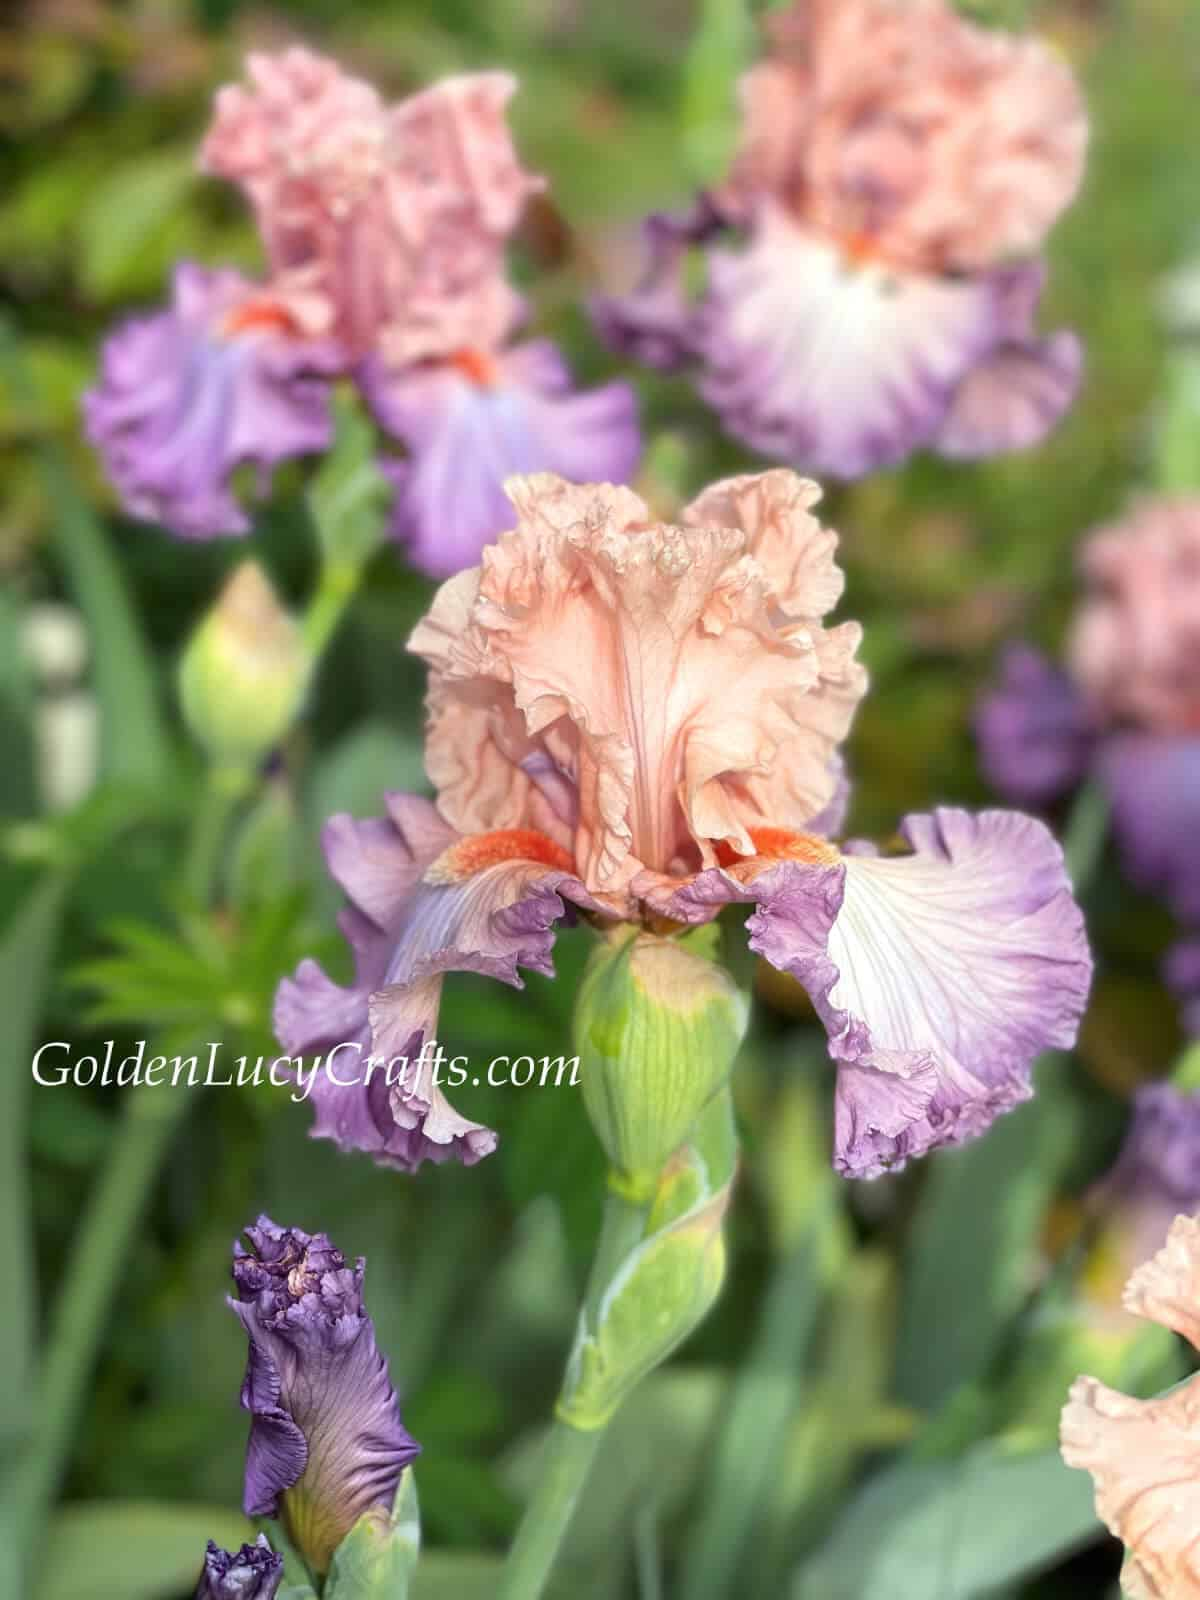 Irises in pale colors.